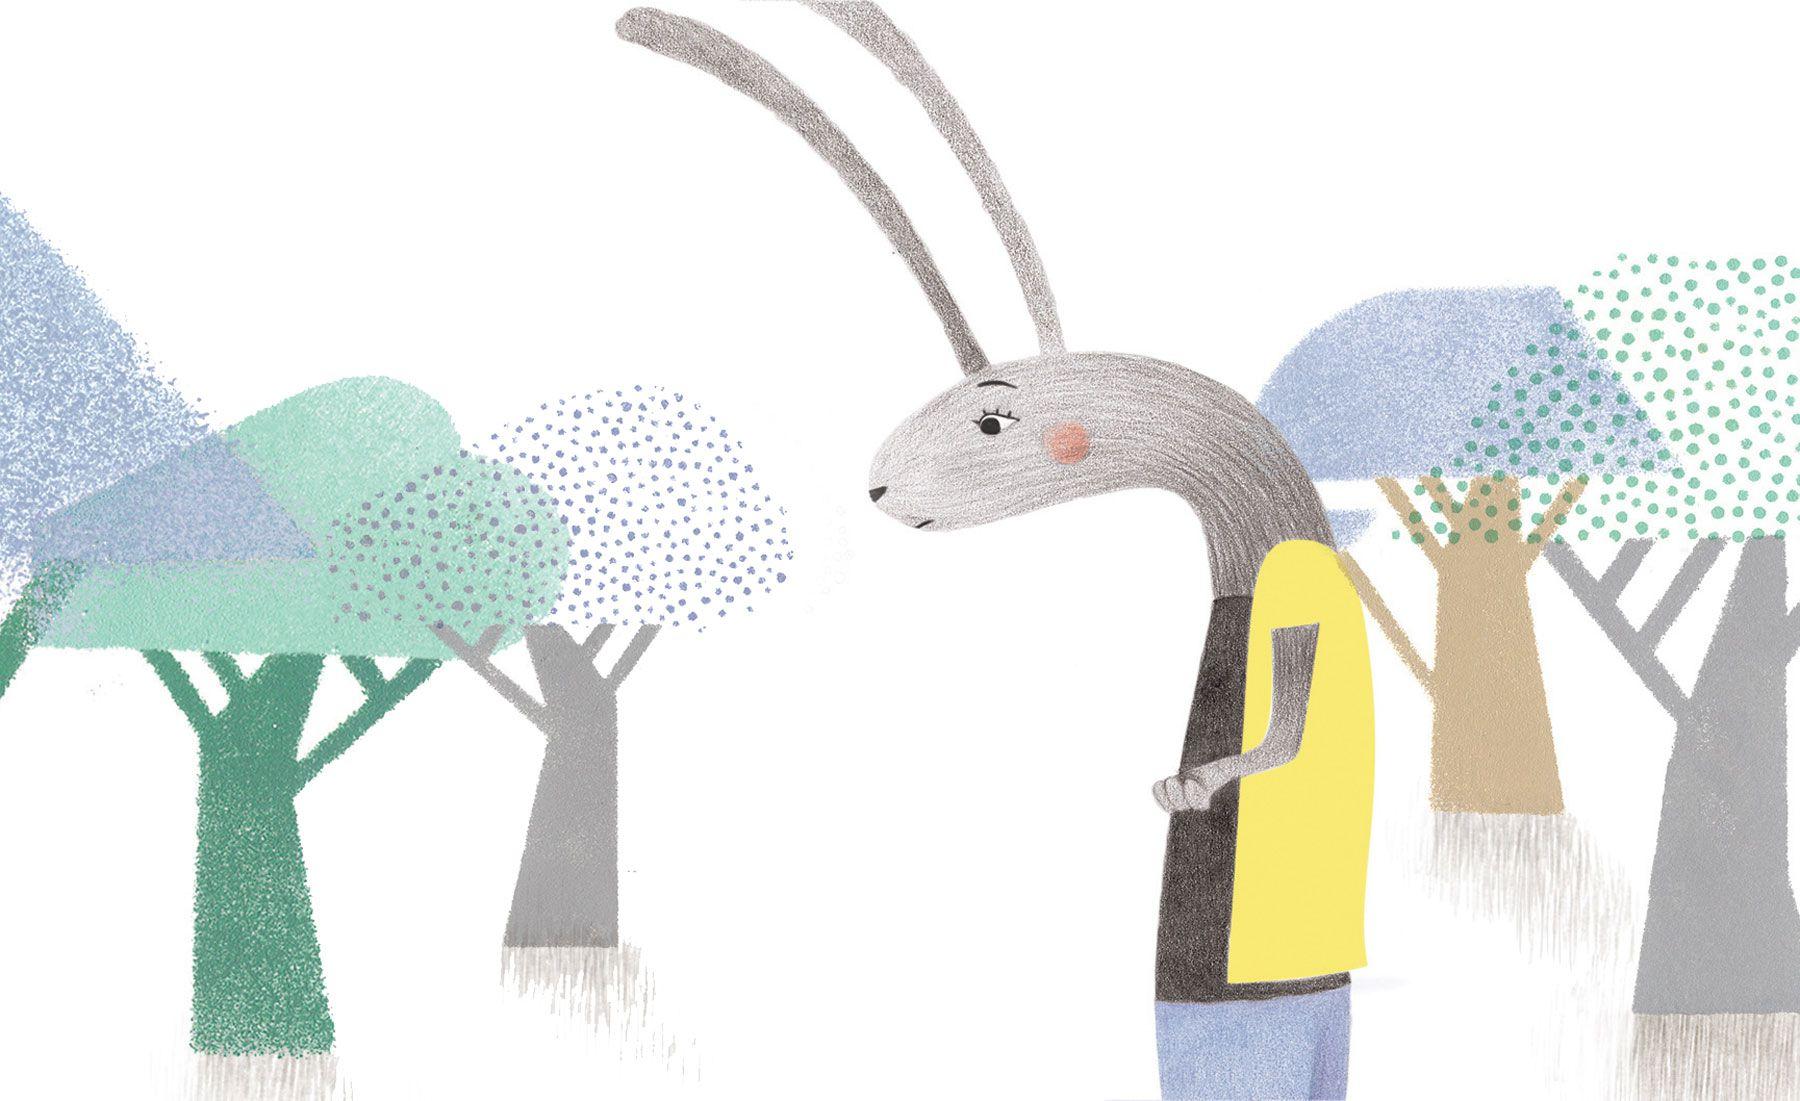 Children's book illustration pencil coloring